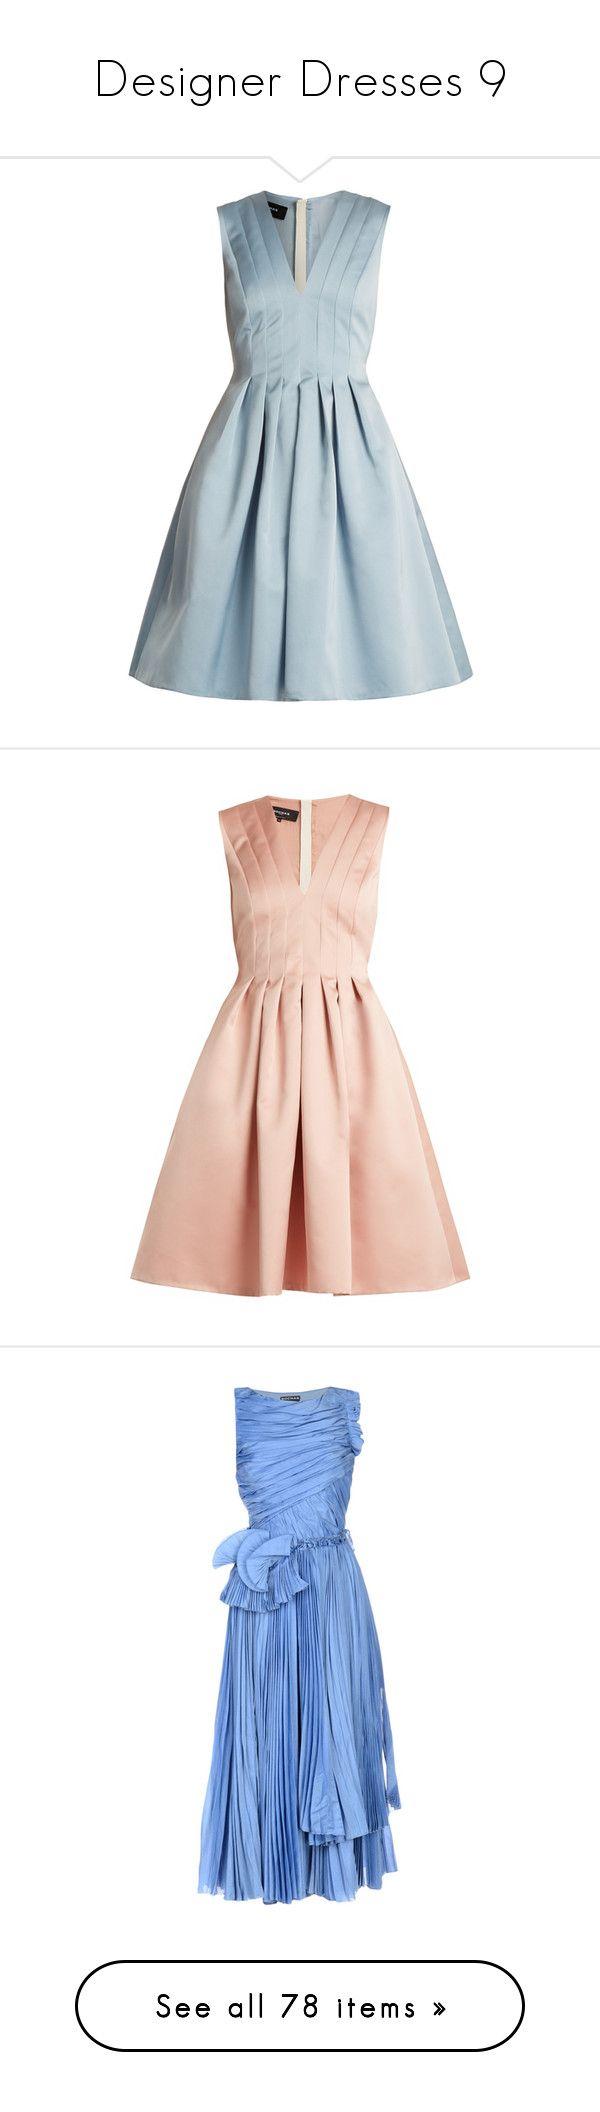 """Designer Dresses 9"" by mickeysmit ❤ liked on Polyvore featuring dresses, light blue, flared pleated skirt, light blue skater skirt, floral printed dress, light blue floral dress, v-neck dresses, light pink, skater skirts and v neck dress"